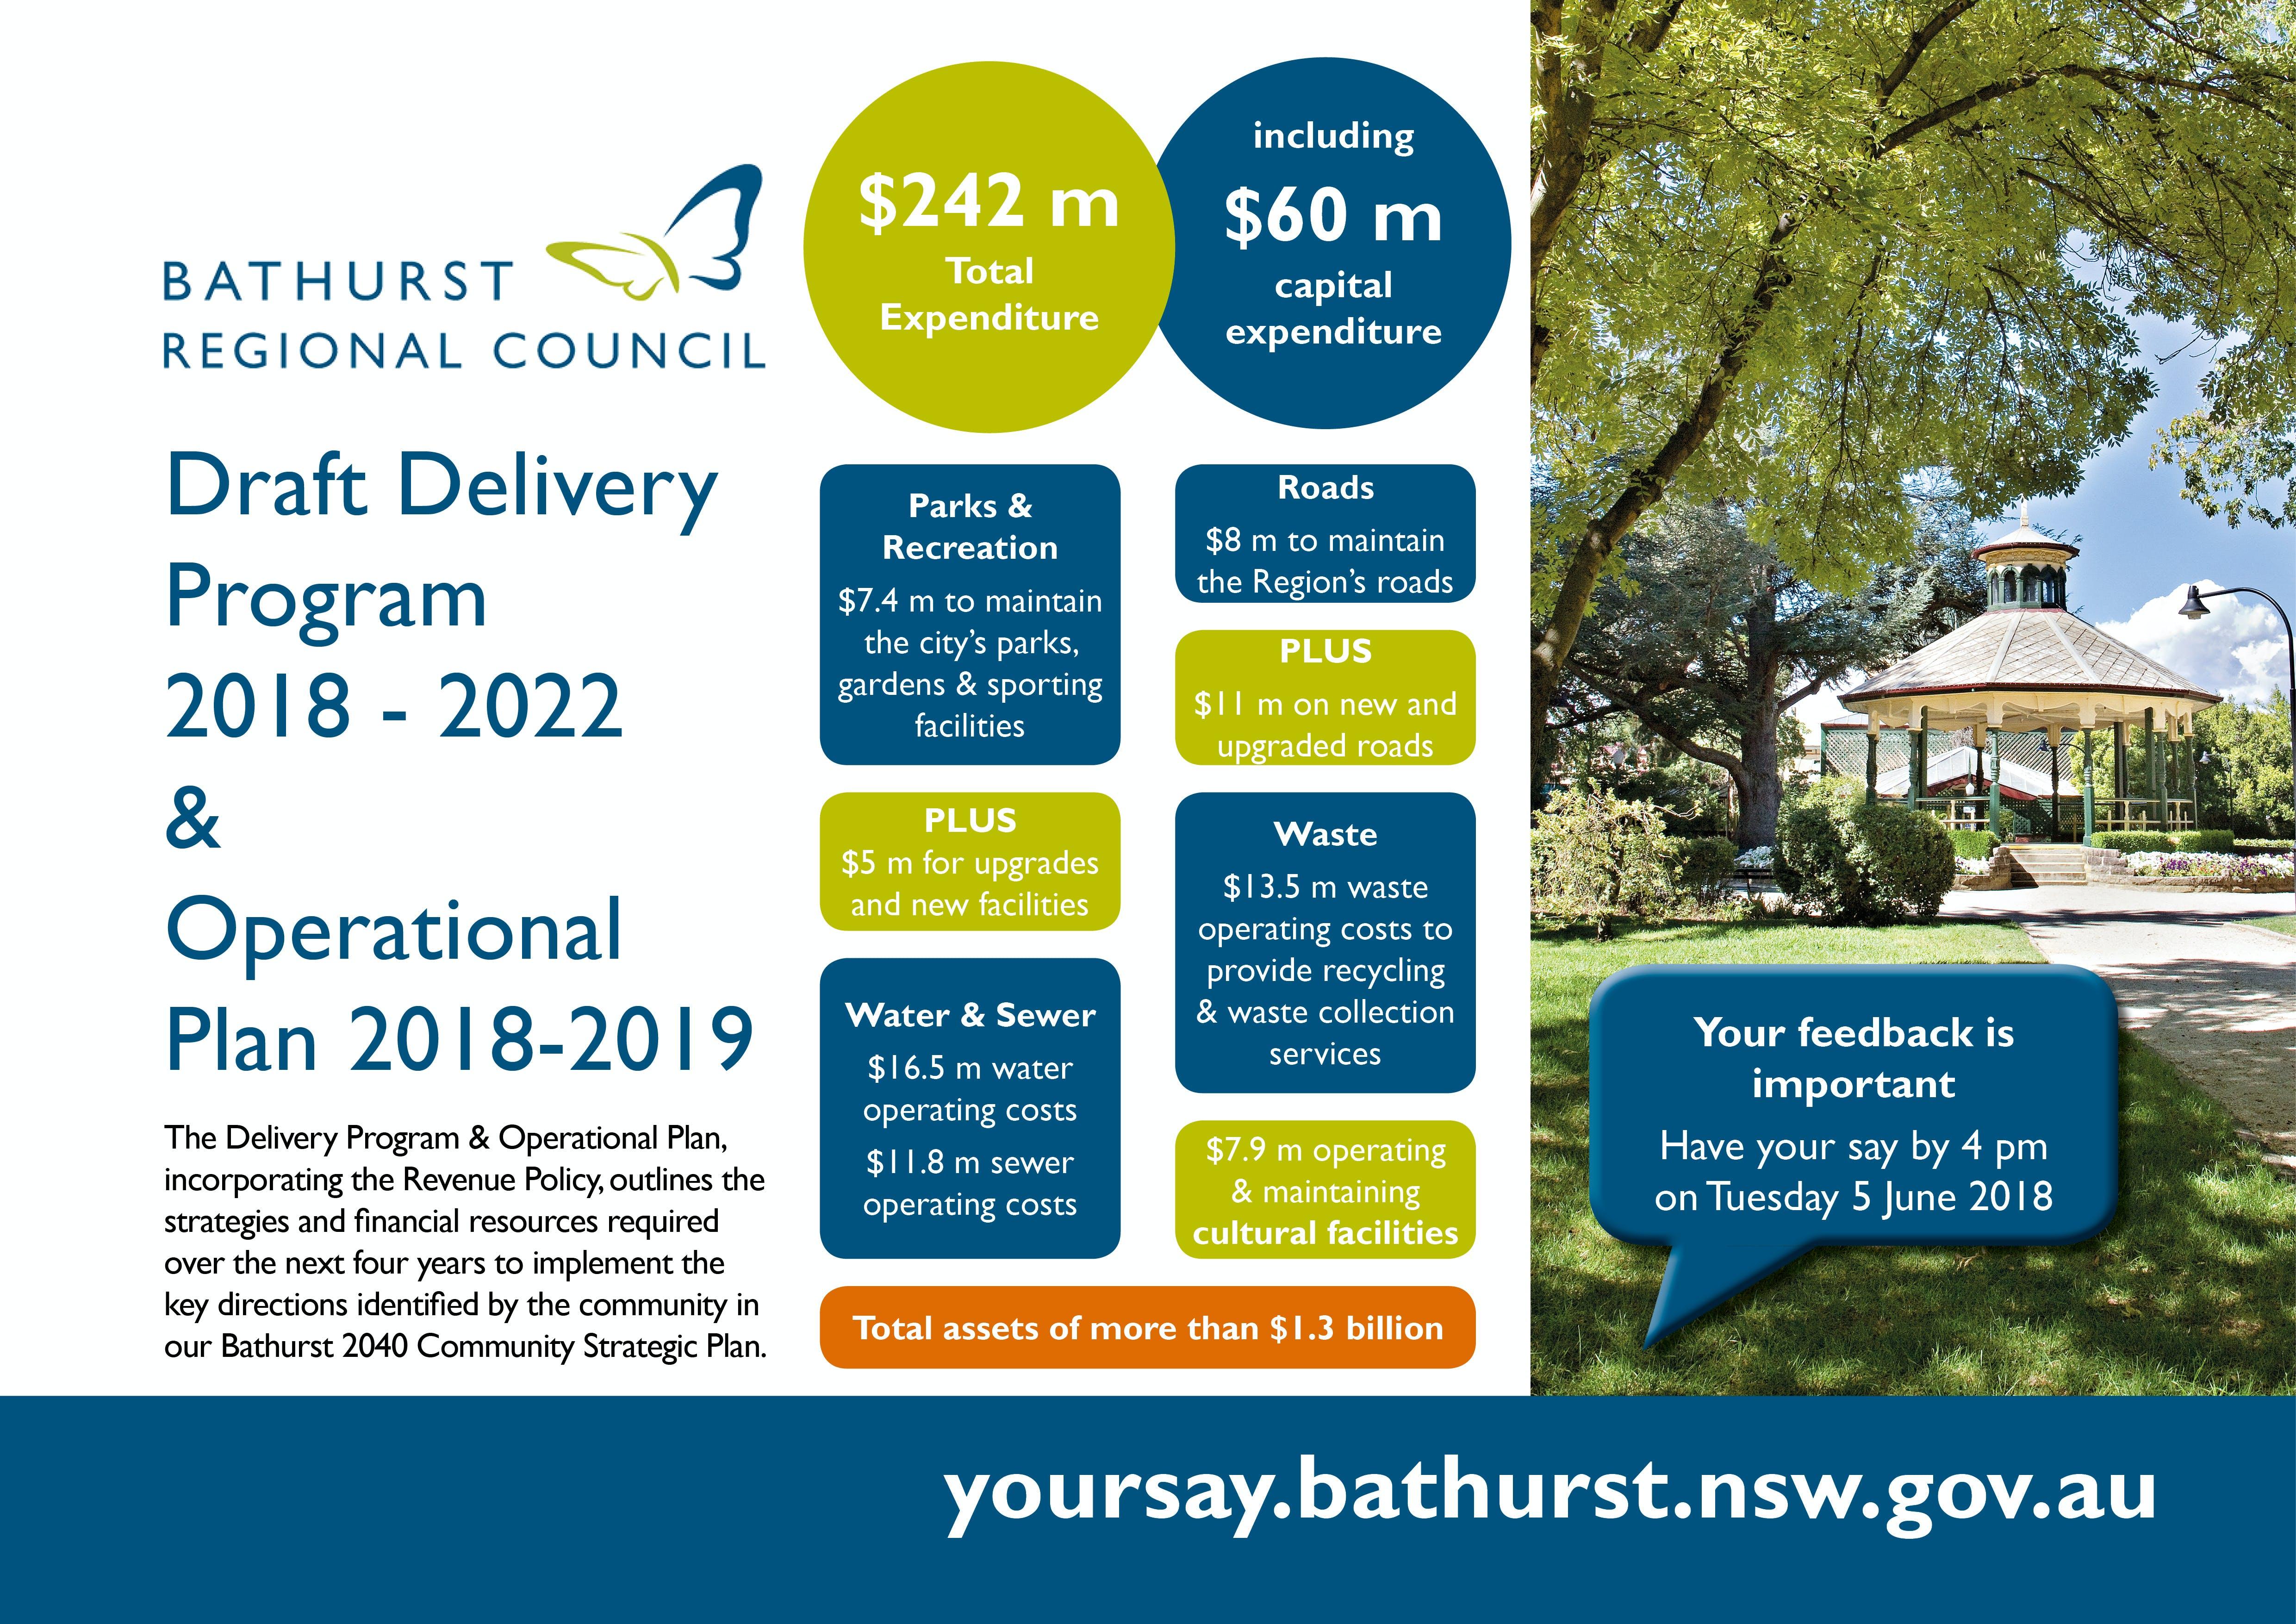 Budget 2018-2019